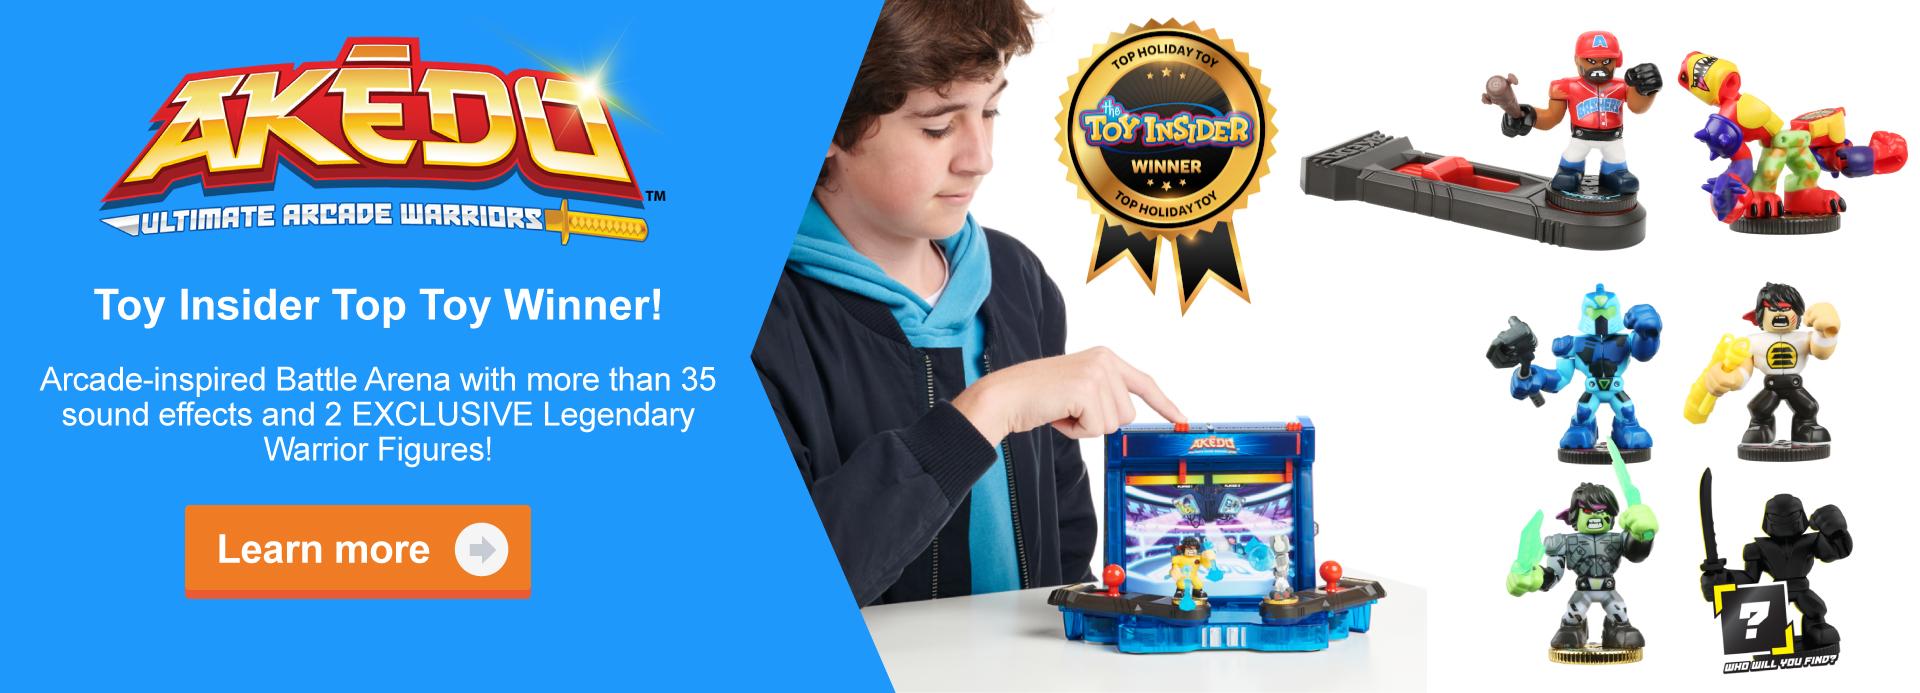 Akedo Ultimate Arcade Warriors